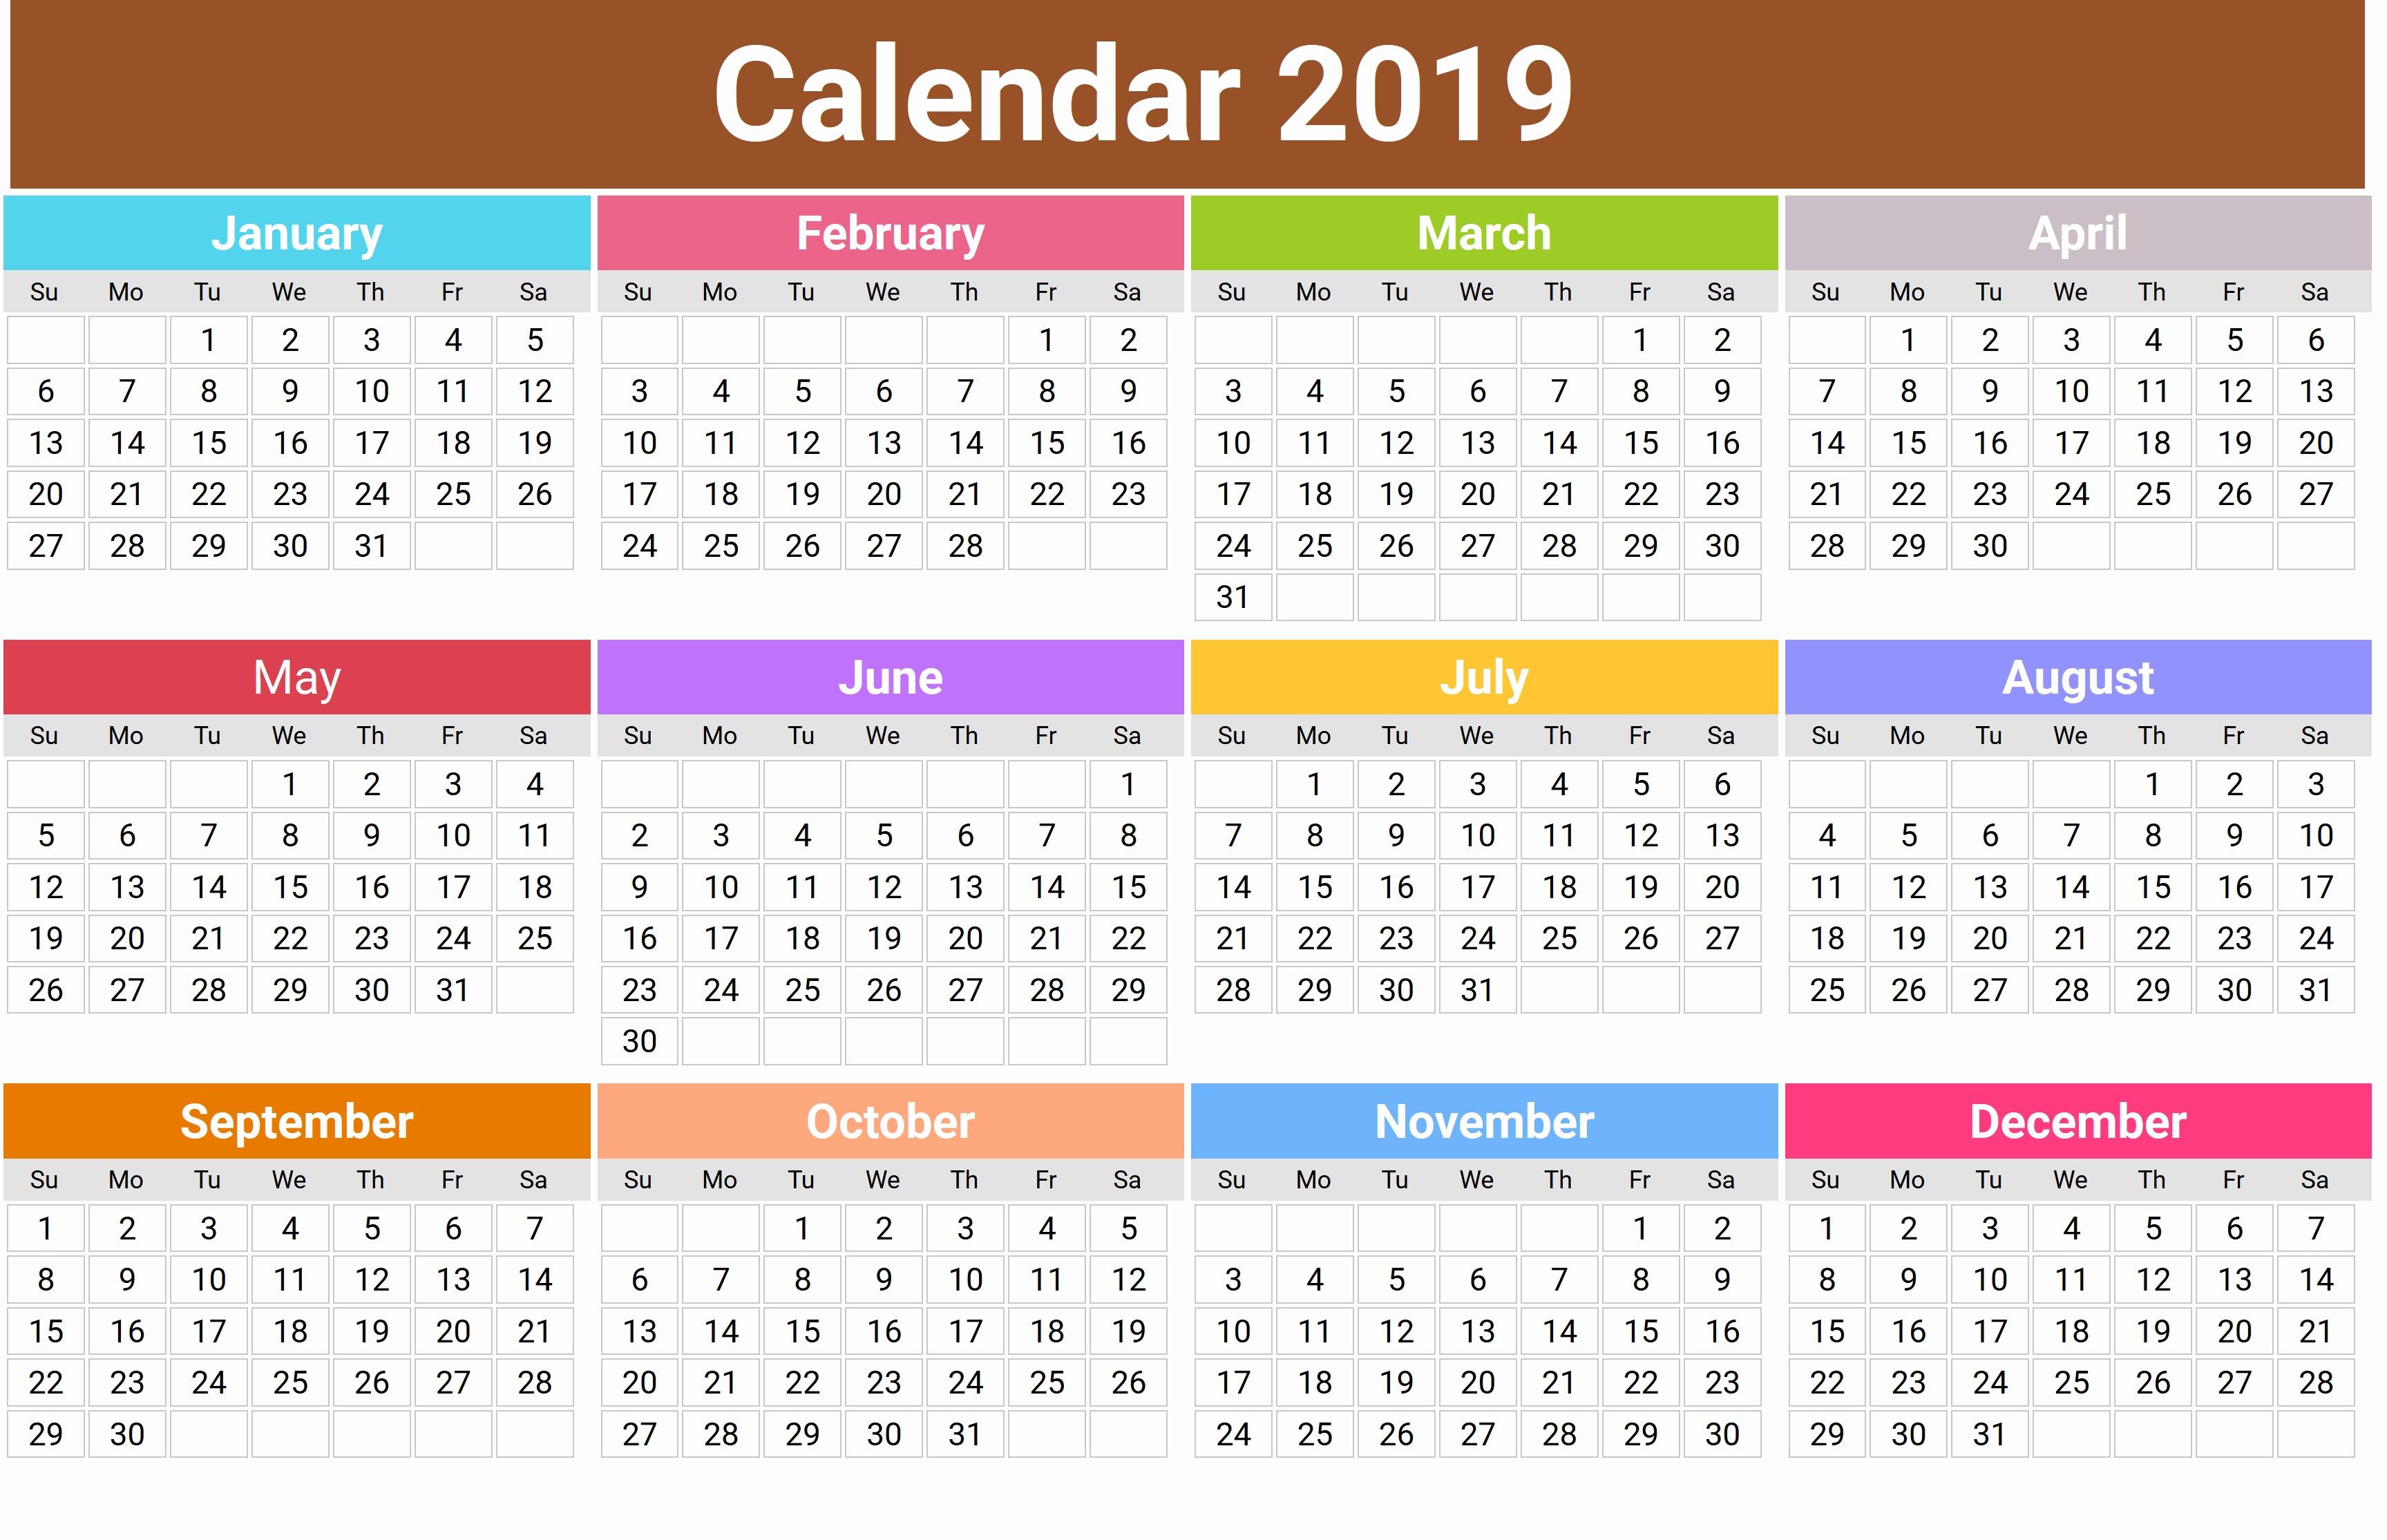 september 2019 calendar with holidays september::Monthly 2019 Holidays Calendar Templates